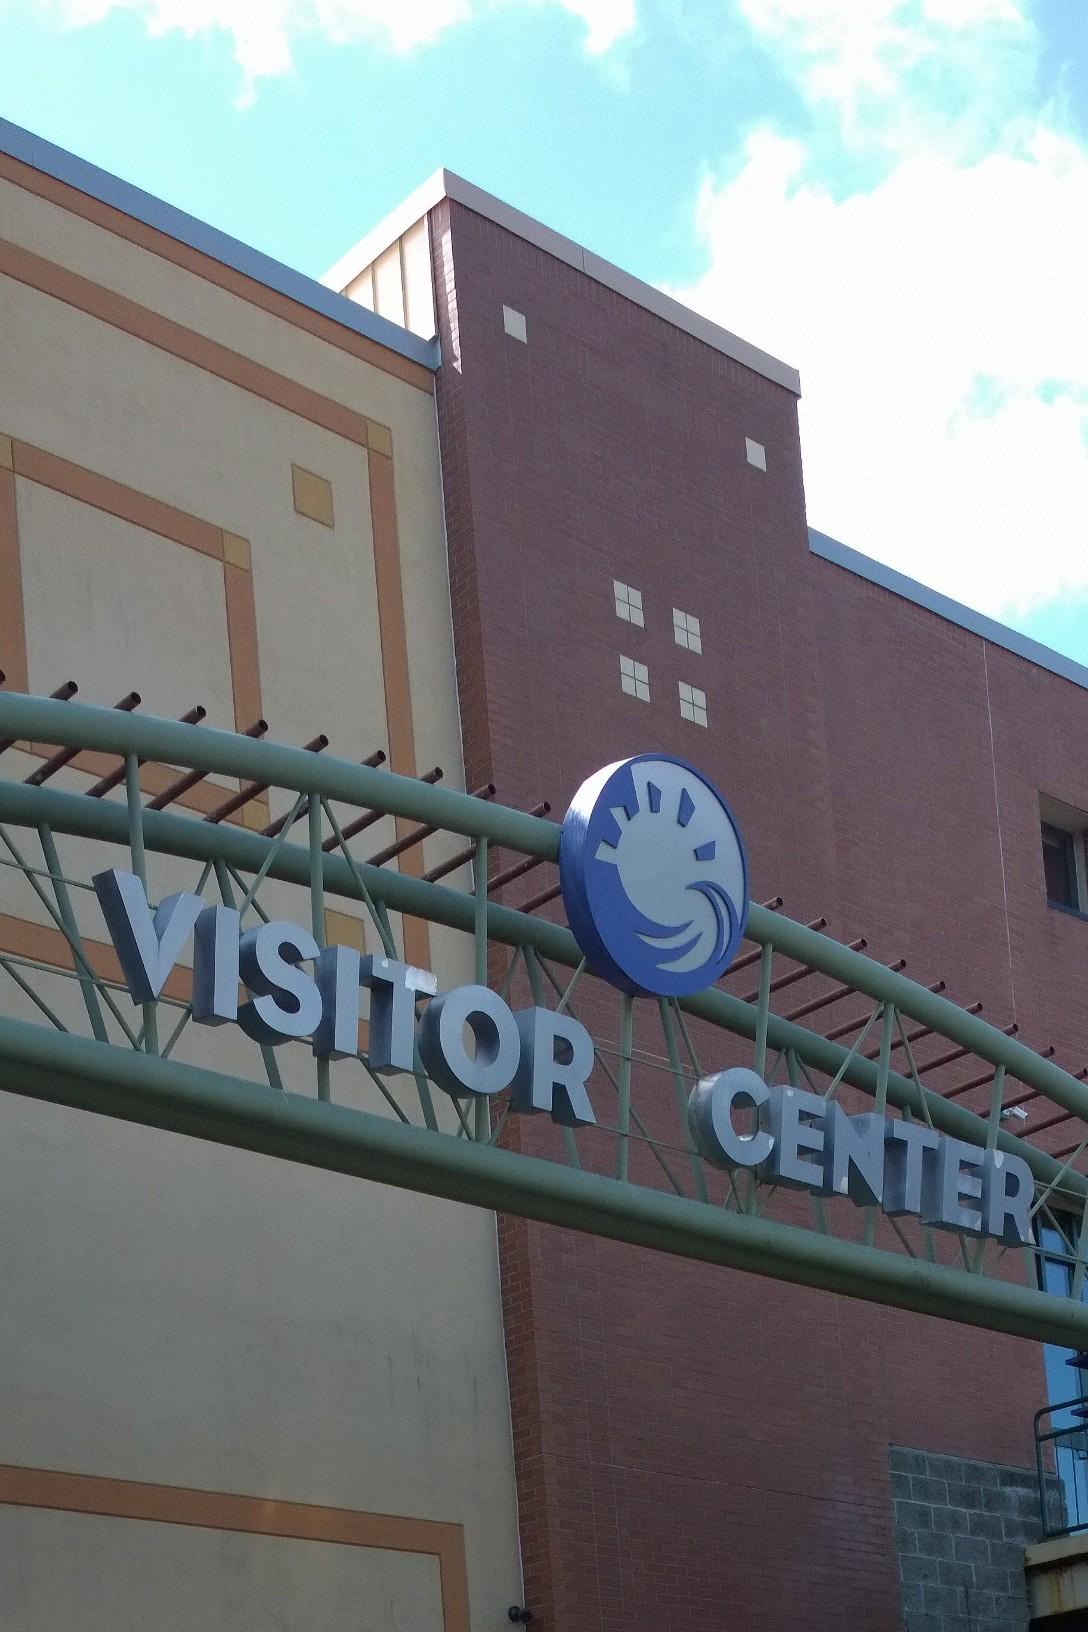 090716-blackstone-valley-visitor-center